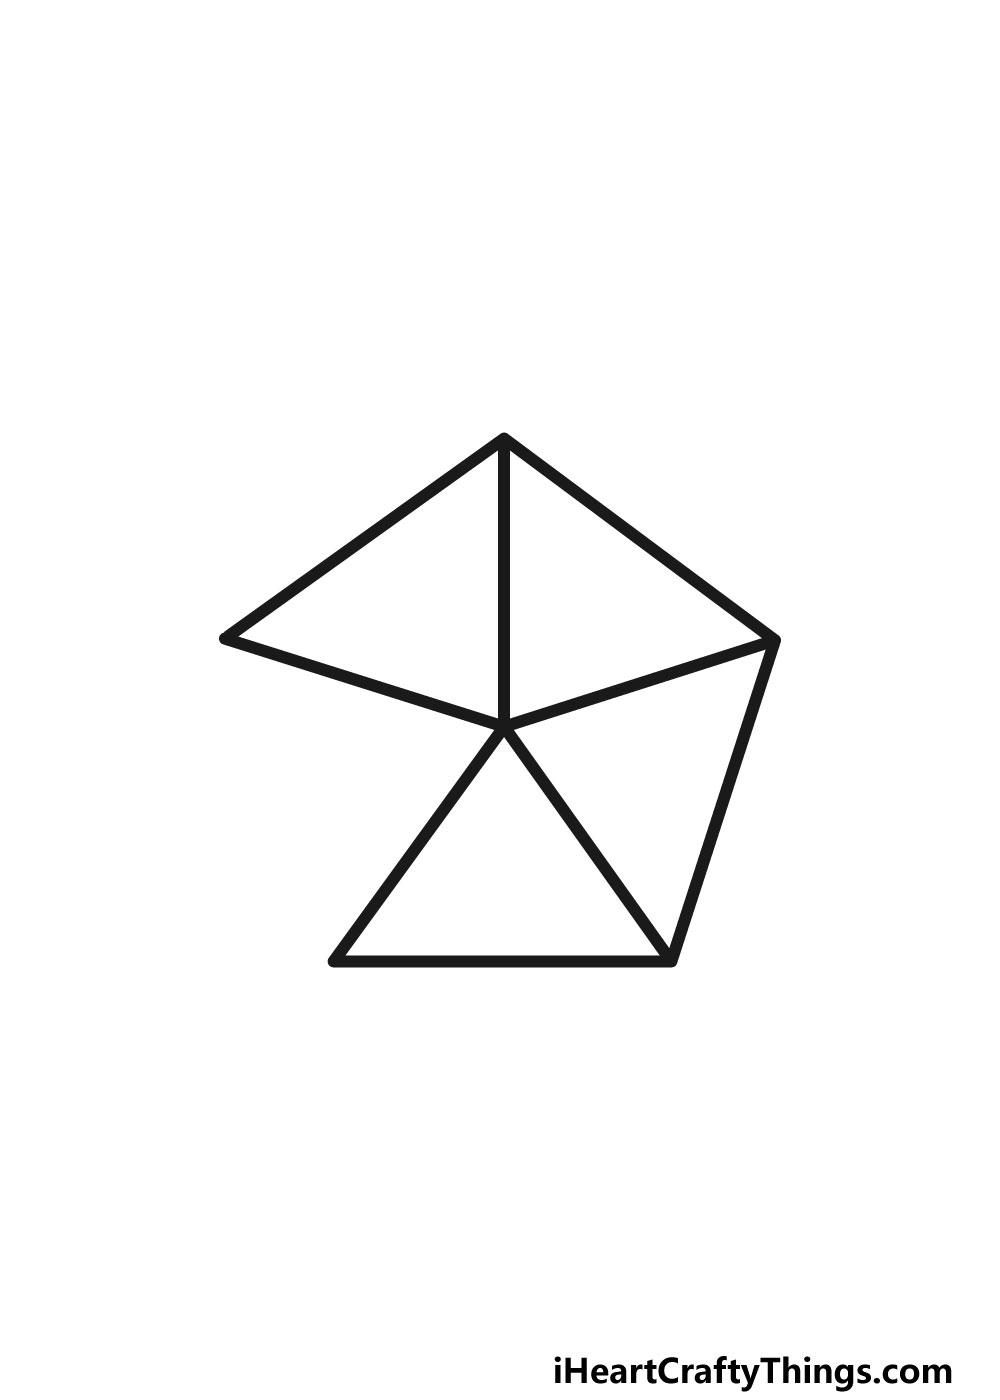 drawing a pentagon step 4